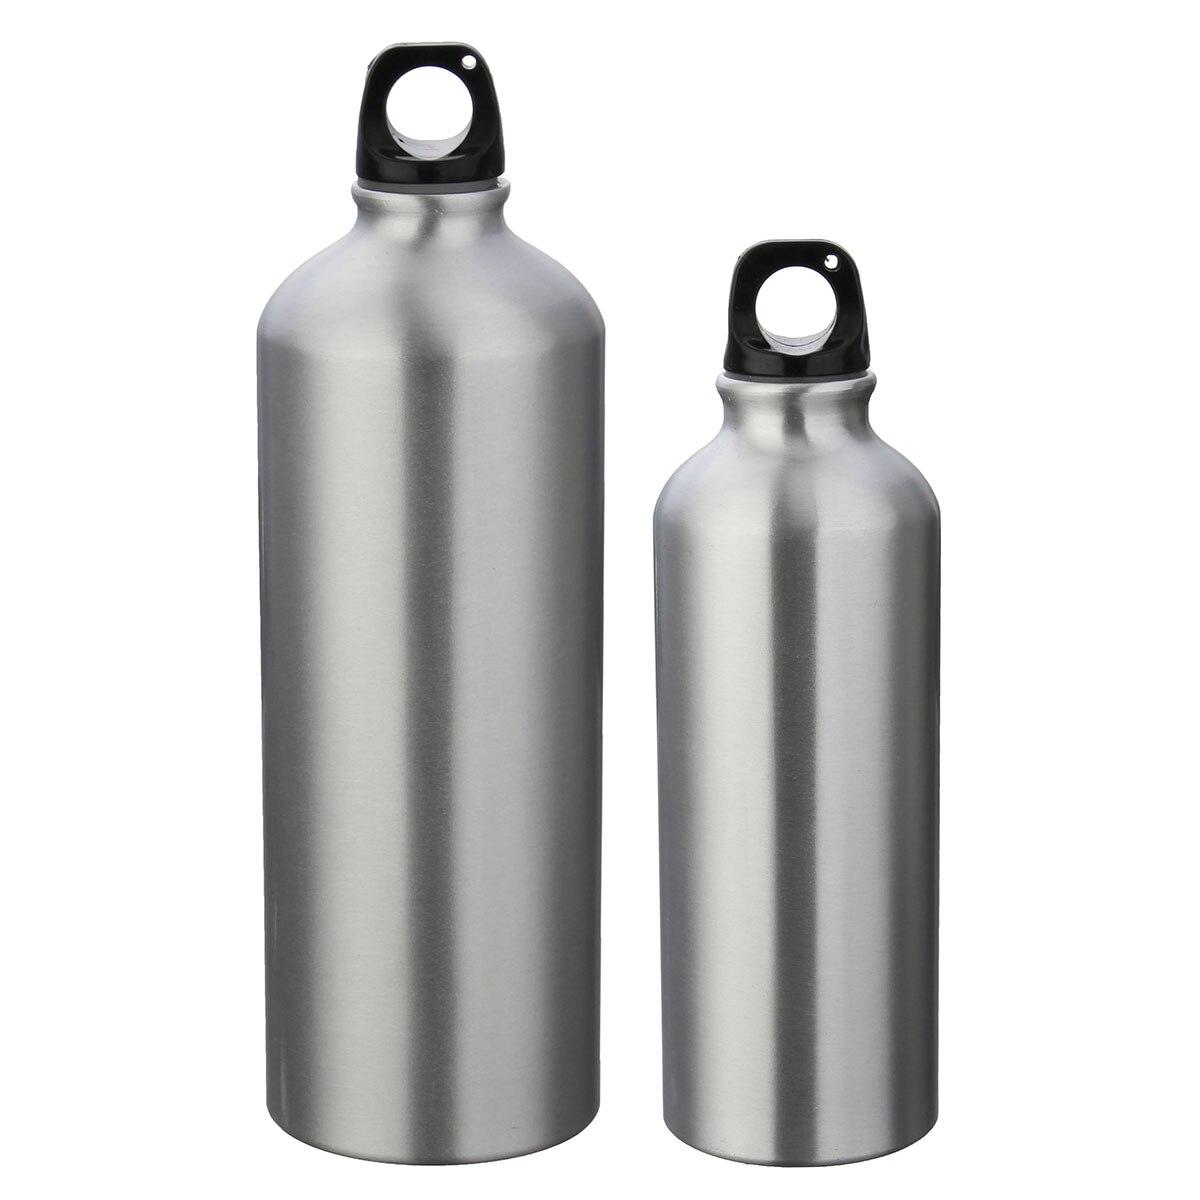 1PC Water Bottle 500ml 1000ml Aluminium Drinking Outdoor Sport Kettle Bicycle Climbing Hiking Travel Supplies Drinkware